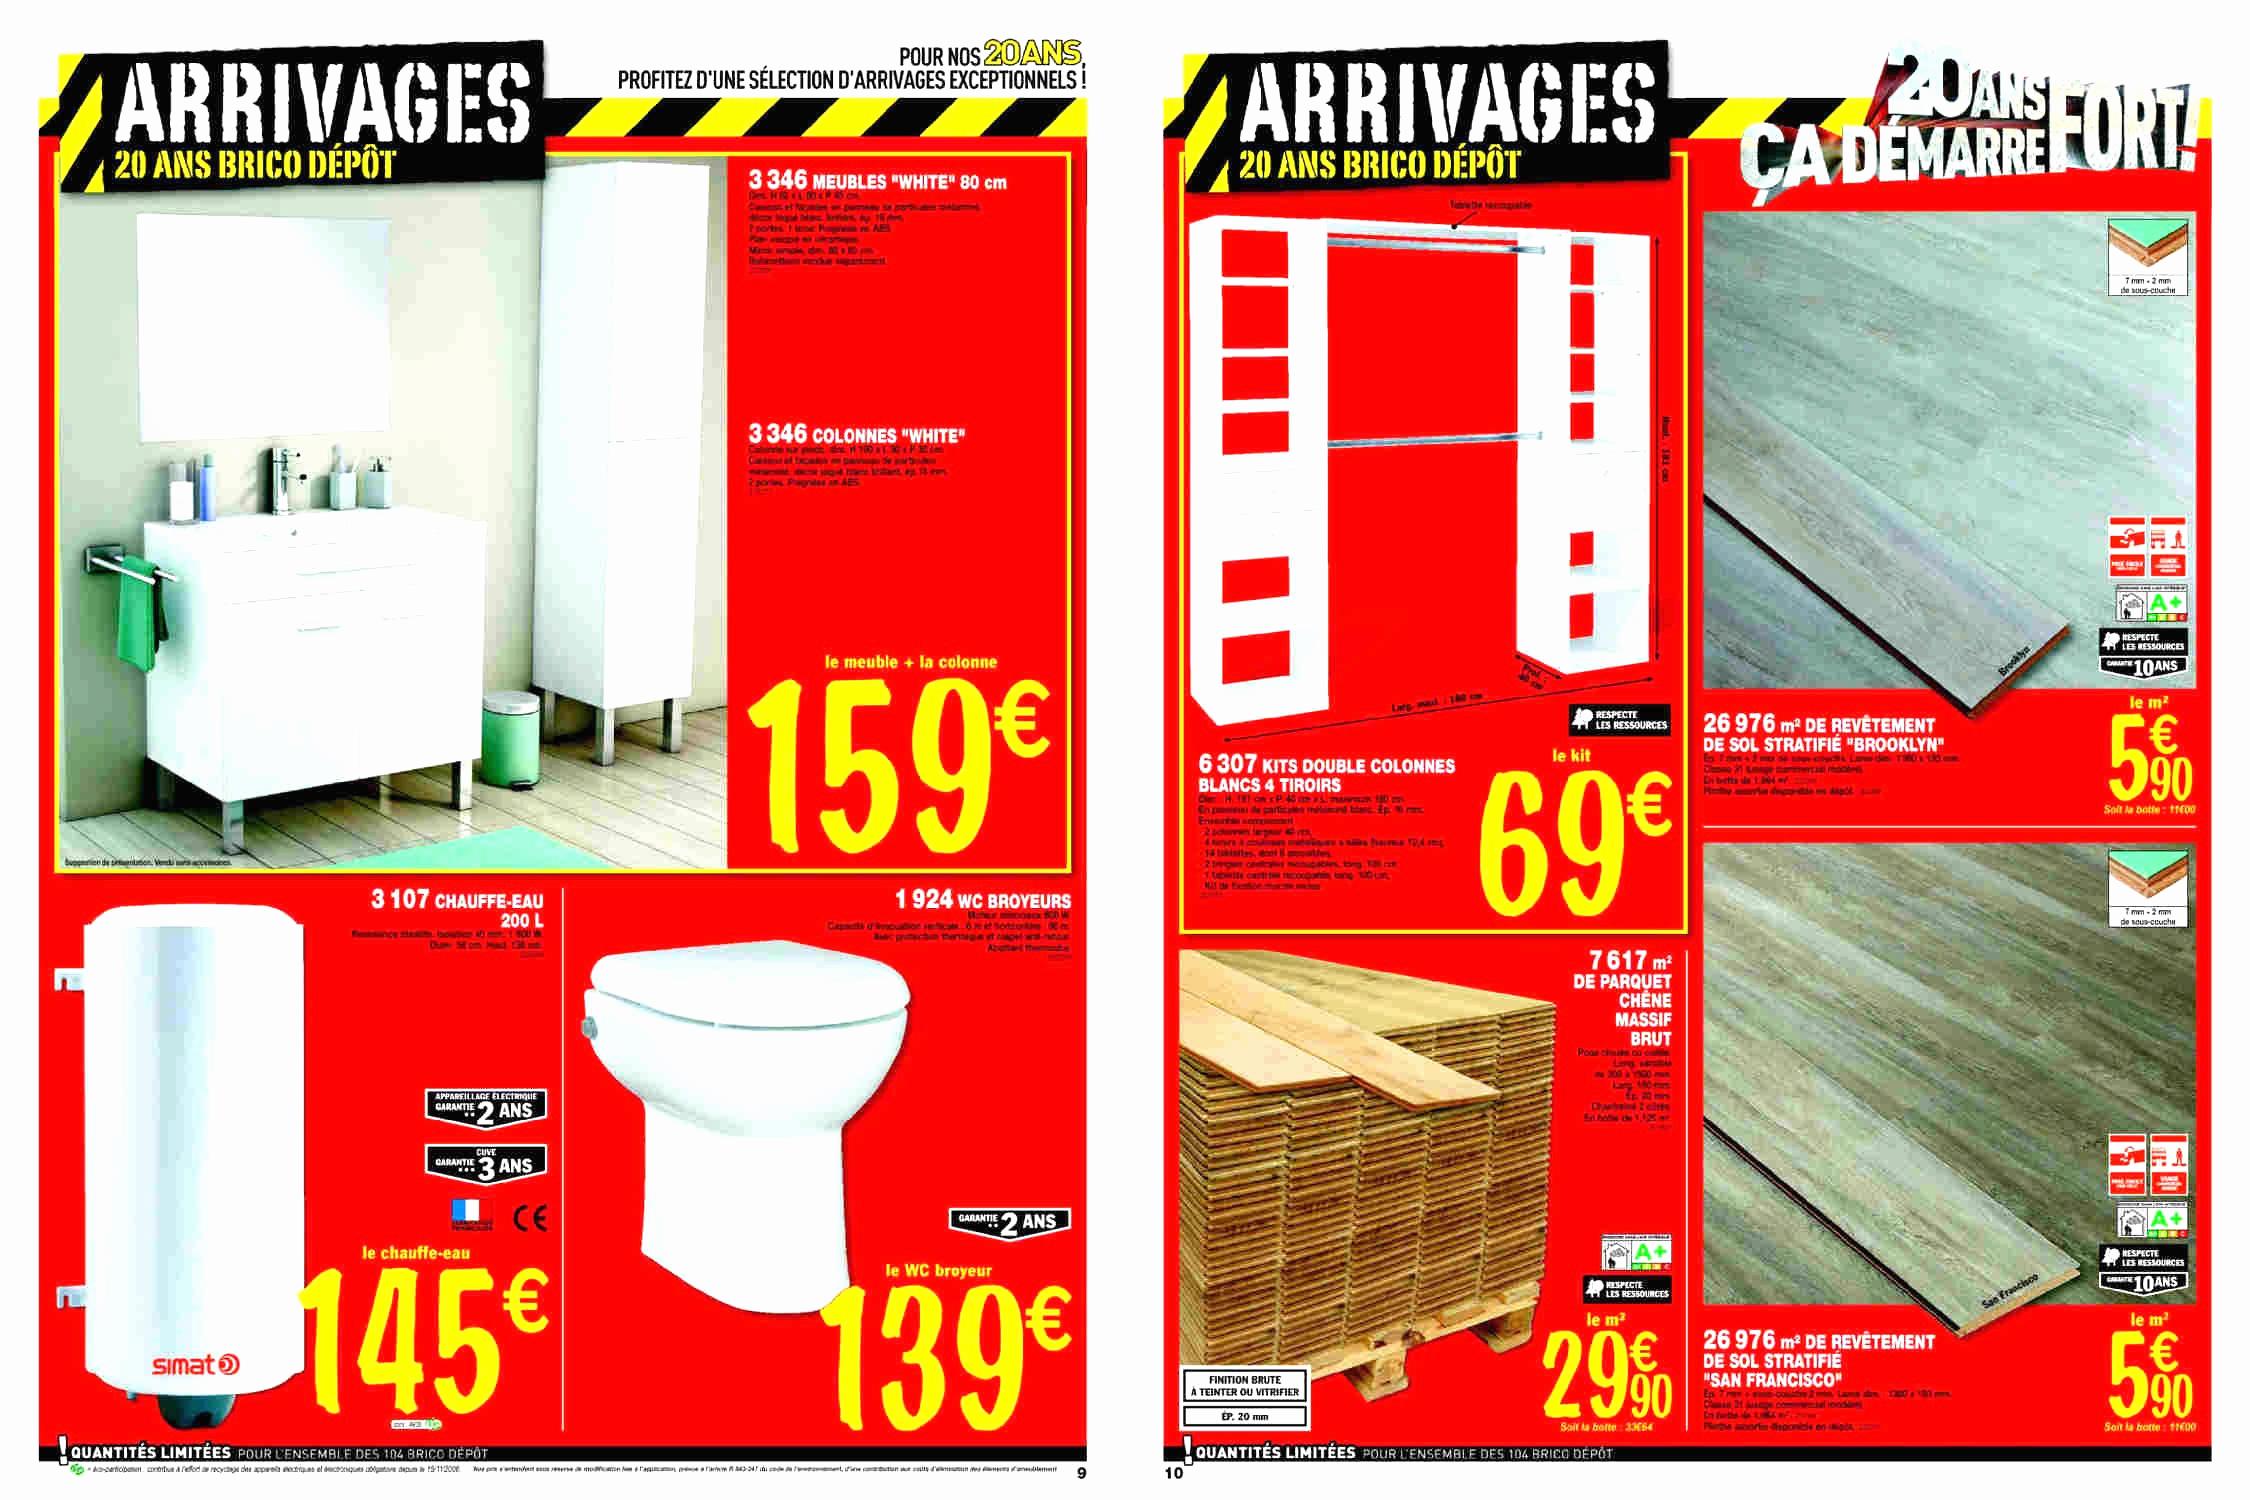 brico depot catalogue cuisine luxe bache transparente pour veranda profil alu pour veranda brico depot of brico depot catalogue cuisine